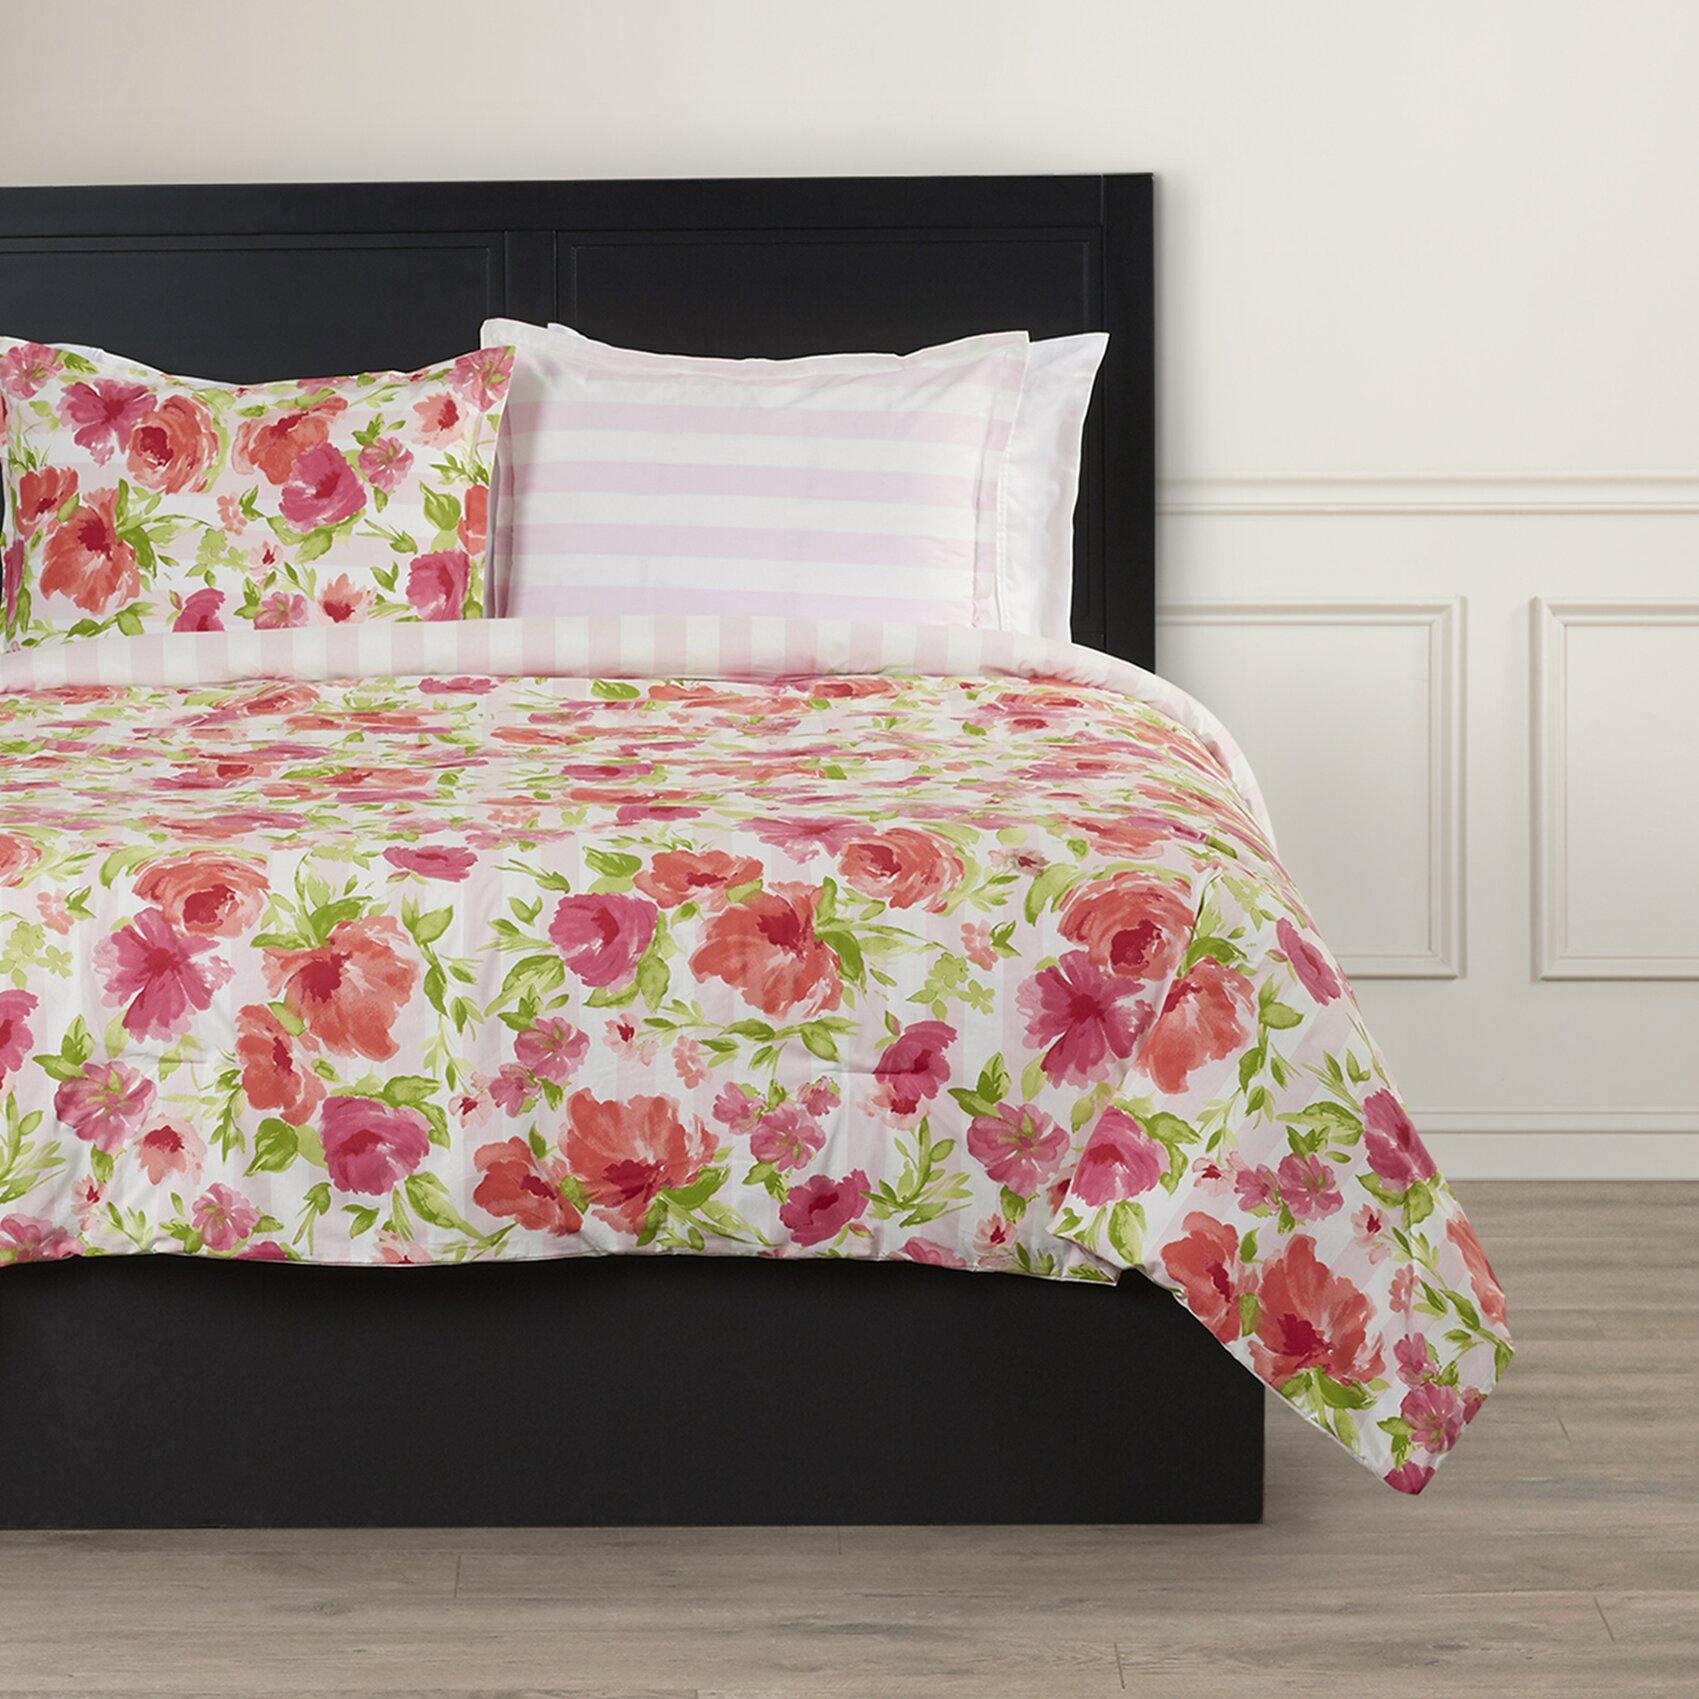 House of hampton pantelle reversible comforter set for House of hampton bedding